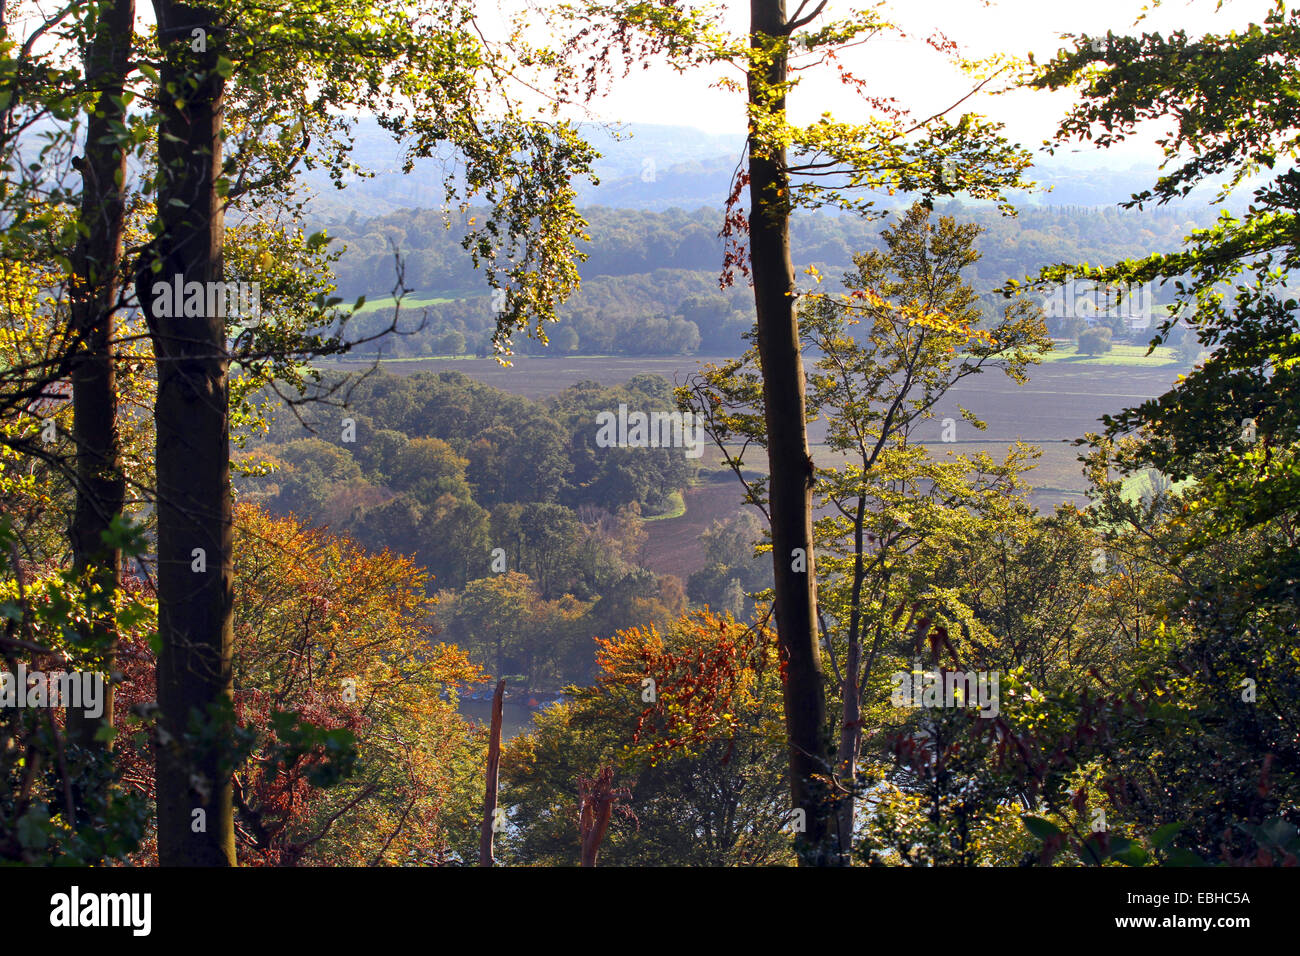 view through gaps in Schelllenberg forest after storm, Germany, North Rhine-Westphalia, Ruhr Area, Essen - Stock Image